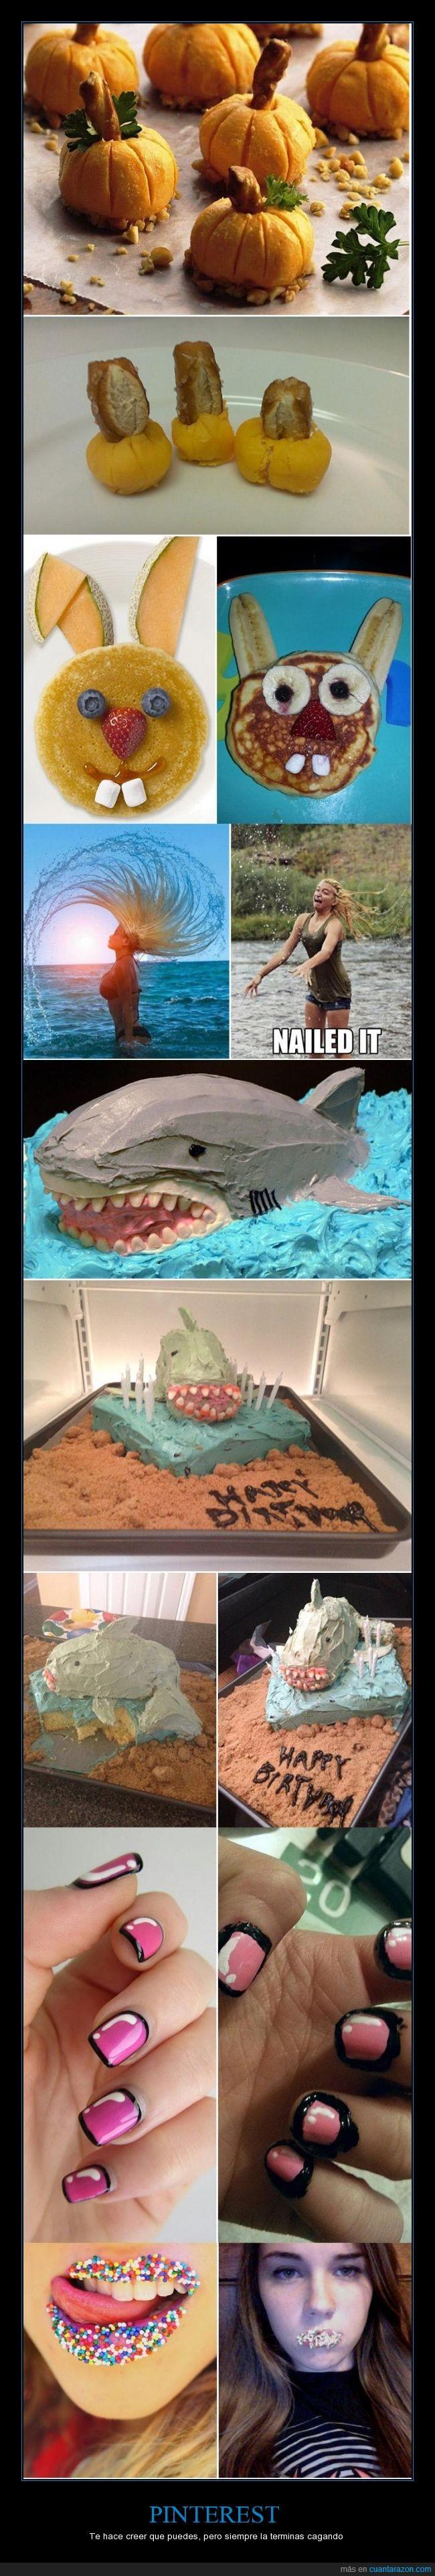 bolitas,calabaza,fail,intenter,pastel,pinterest,real,tarta,tiburon,triste,uñas